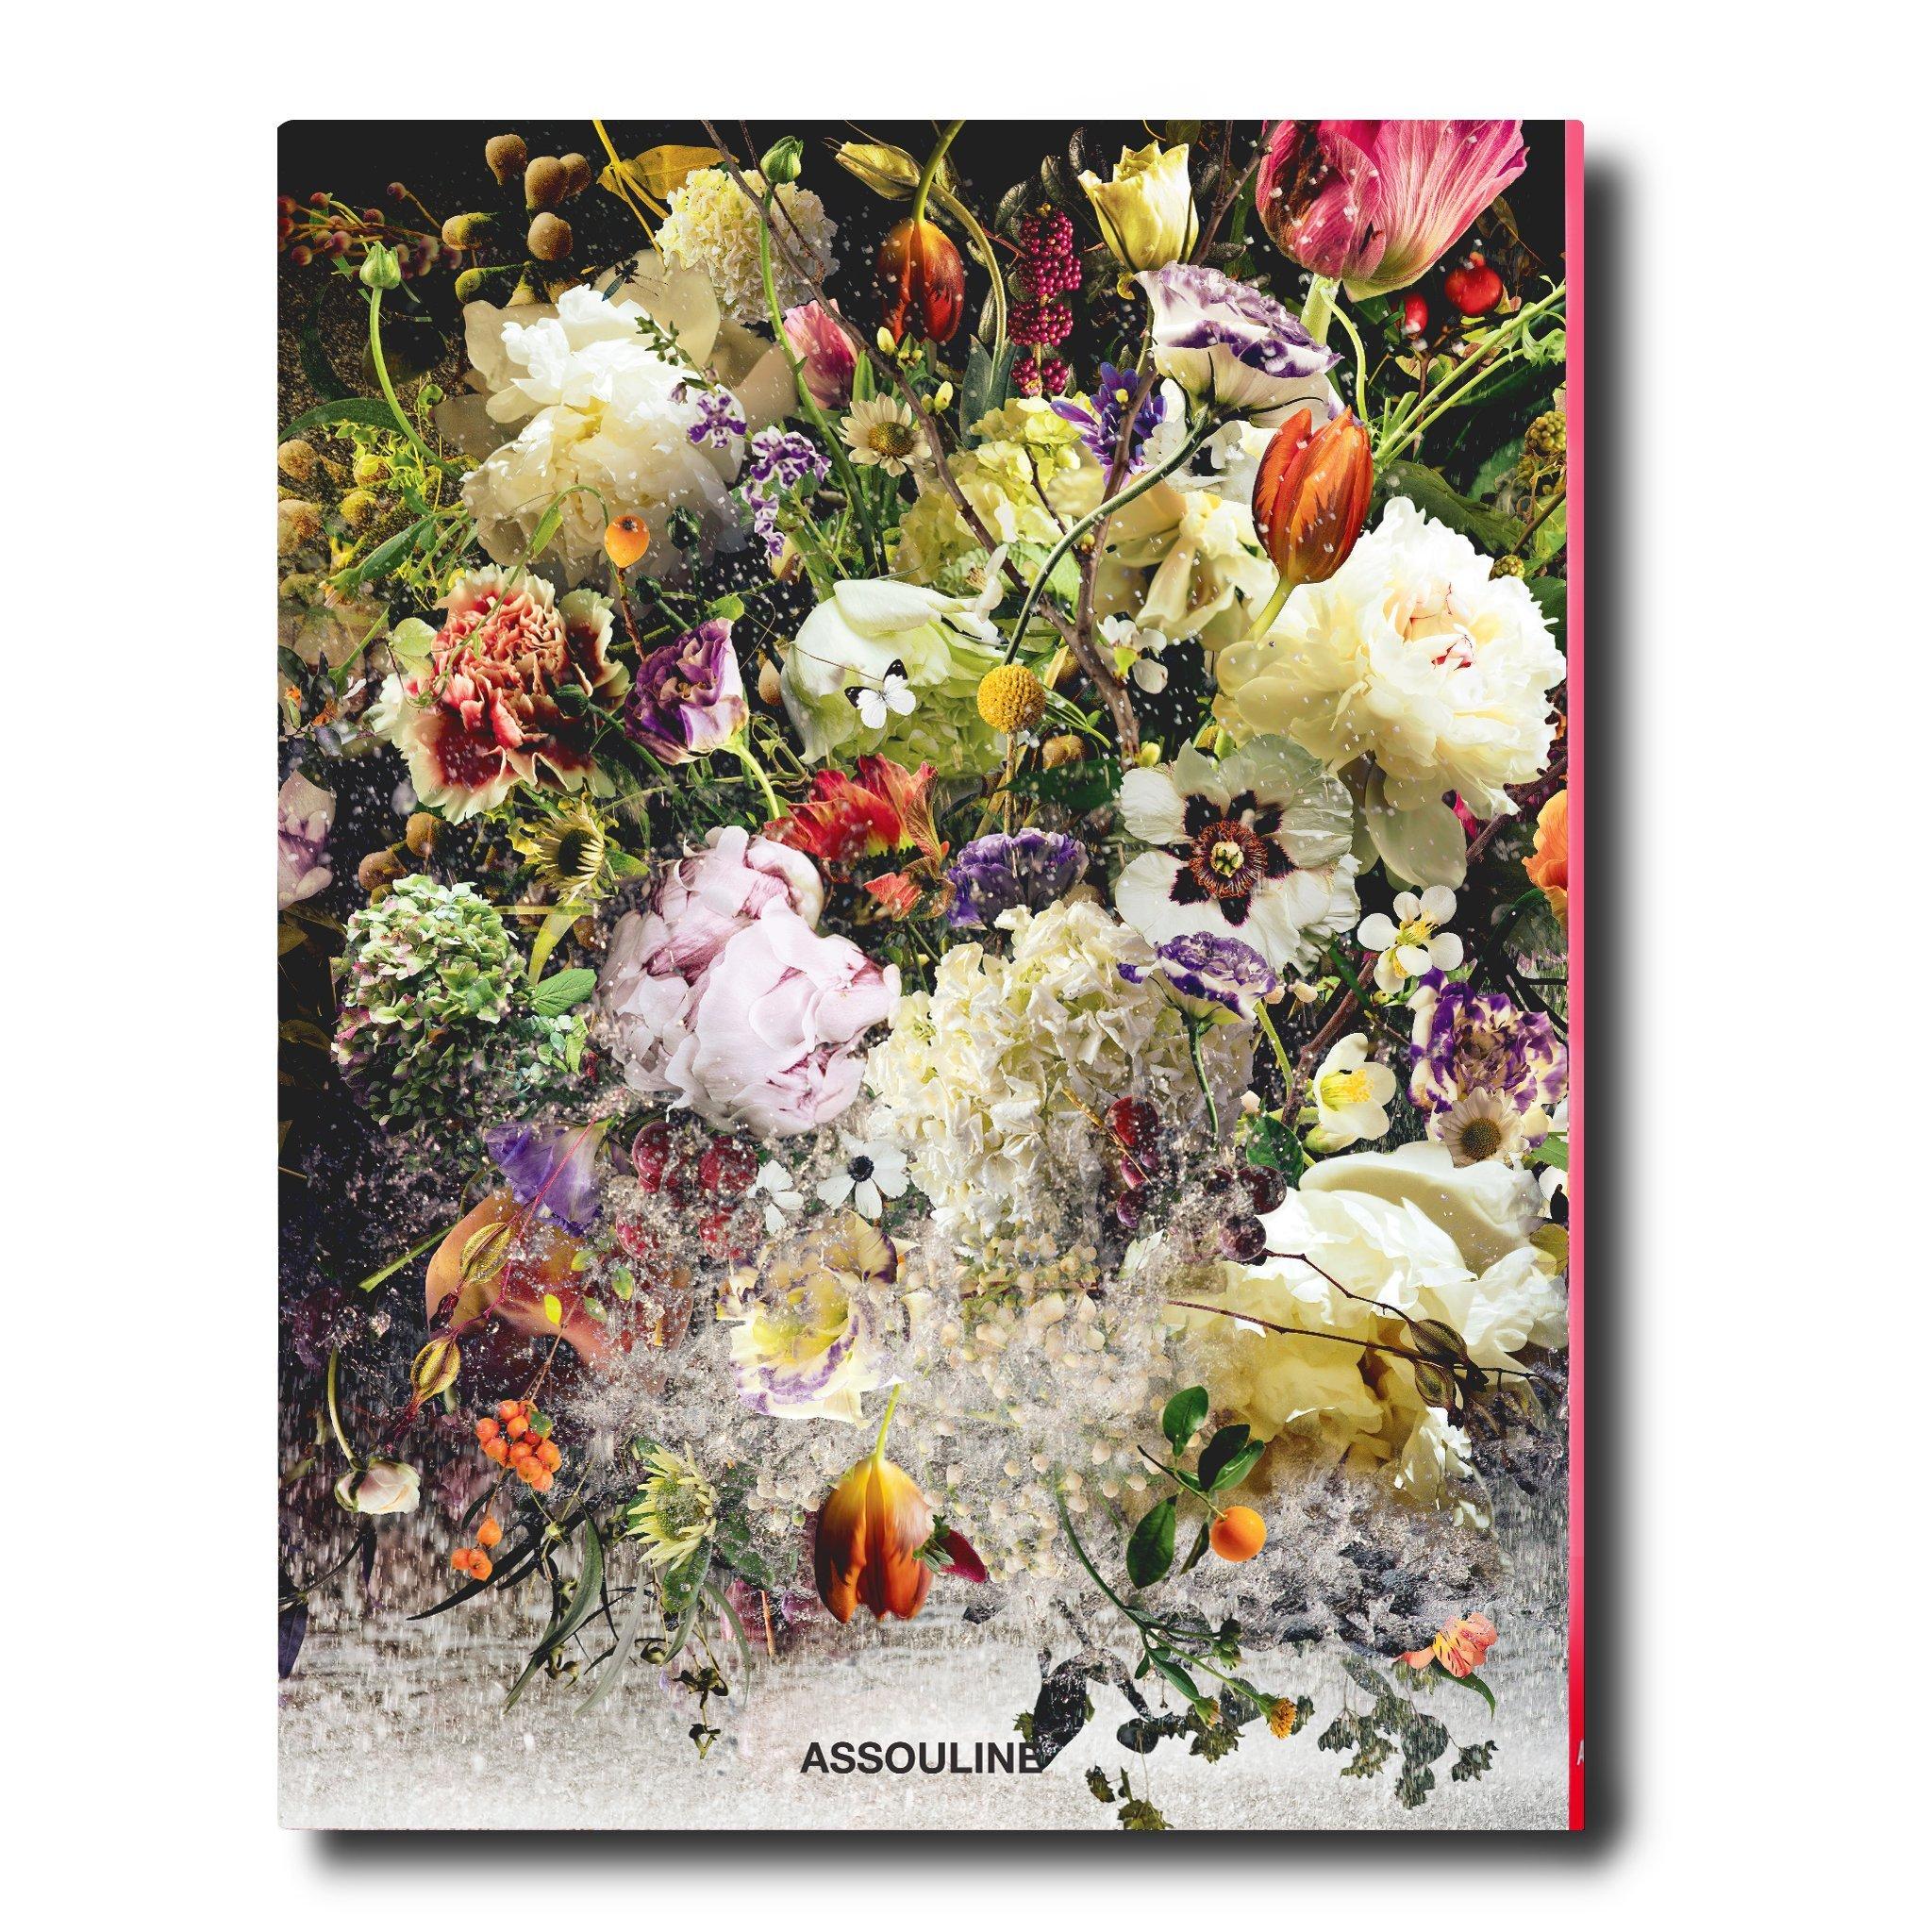 Flowers: Art & Bouquets book by Sixtine Dubly   ASSOULINE – Assouline